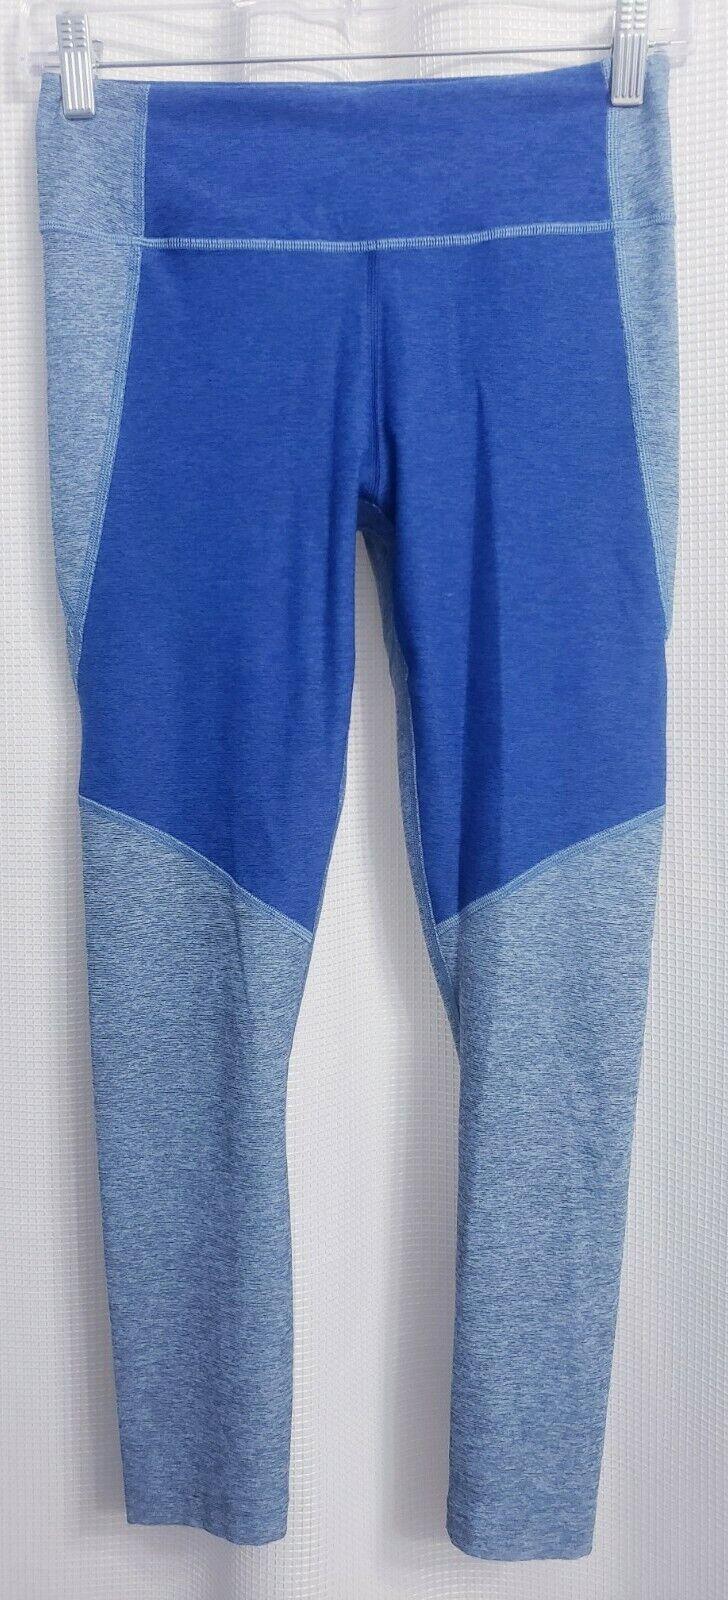 Outdoor Voices Blue Capri Leggings Women's size SMALL